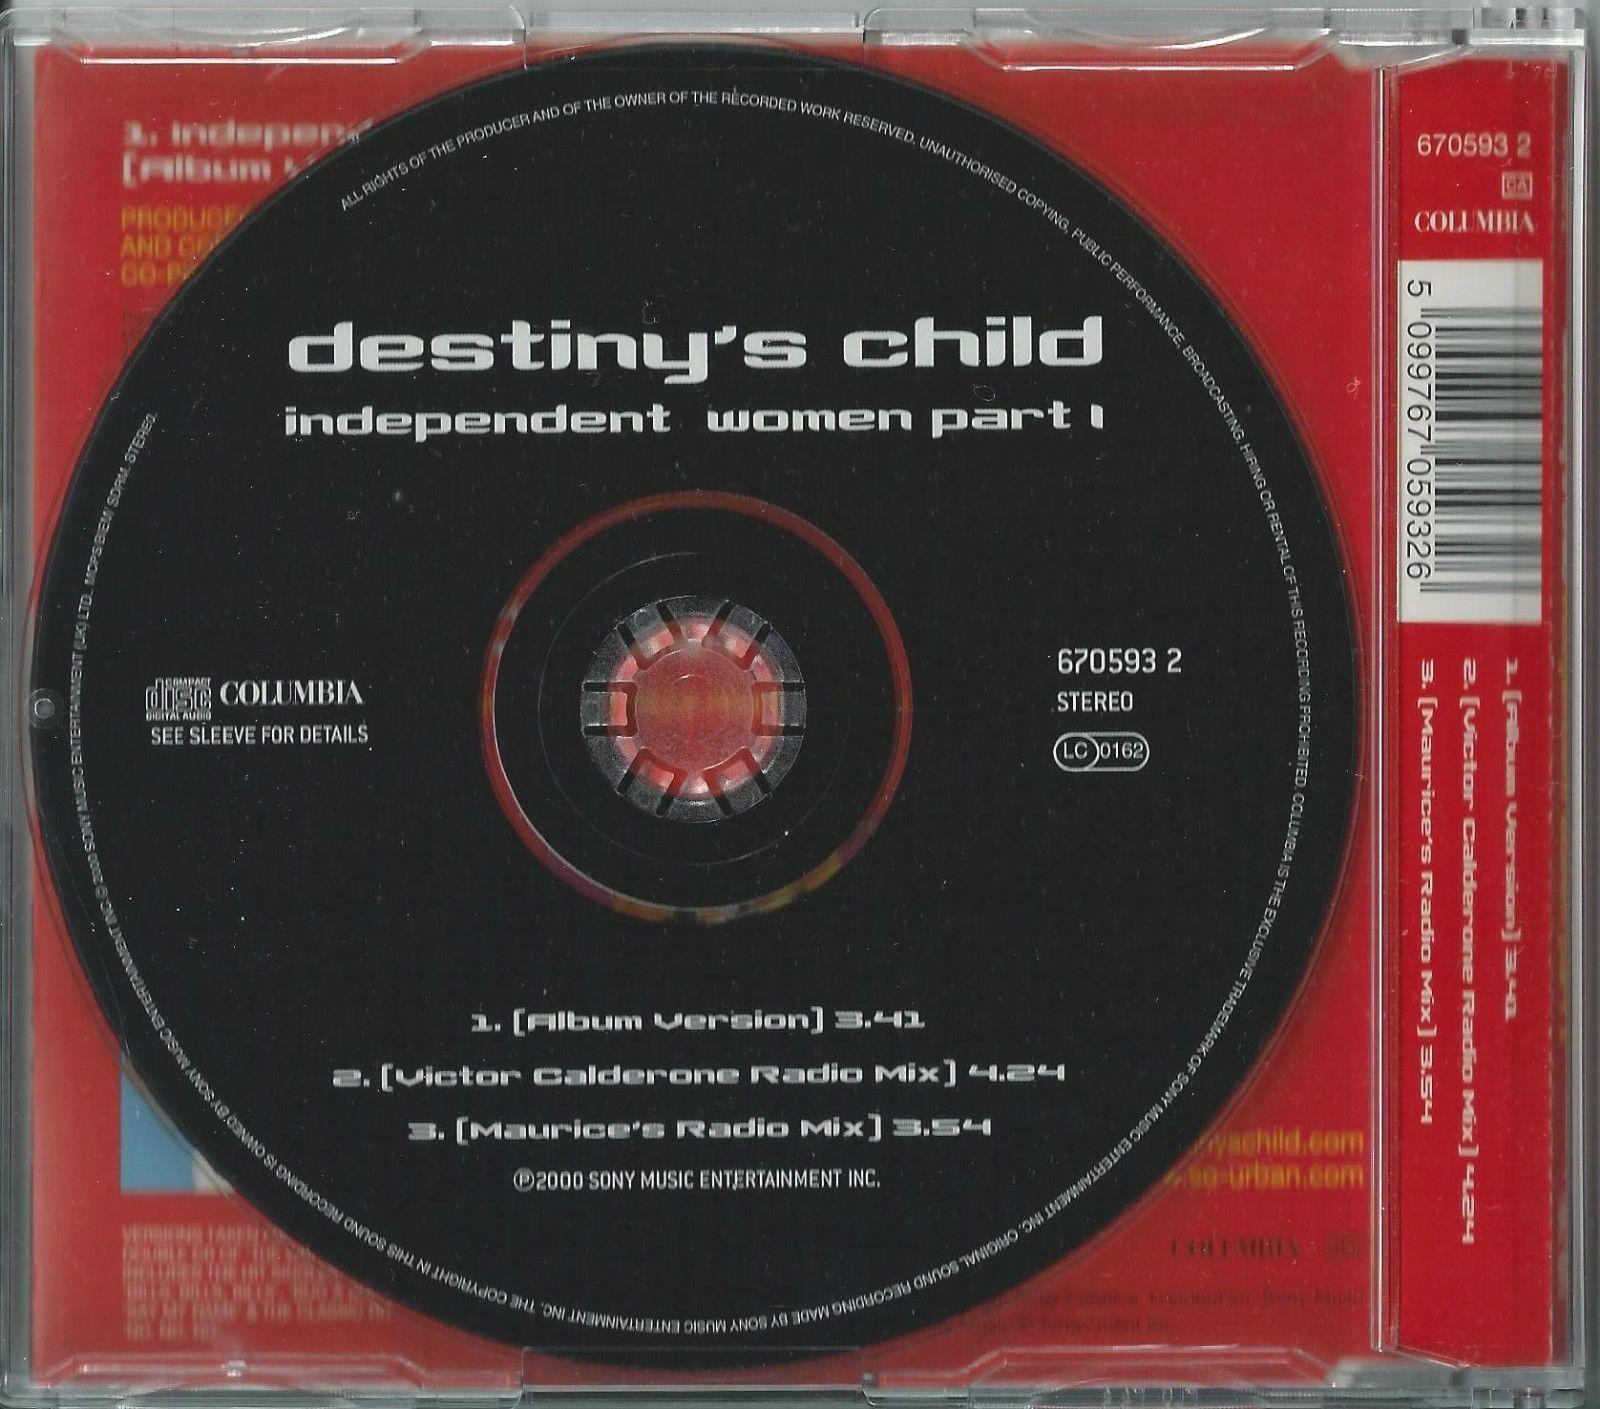 DESTINY'S CHILD - INDEPENDENT WOMEN PART I / (REMIXES) 2000 UK 3 TRACK CD PART 1